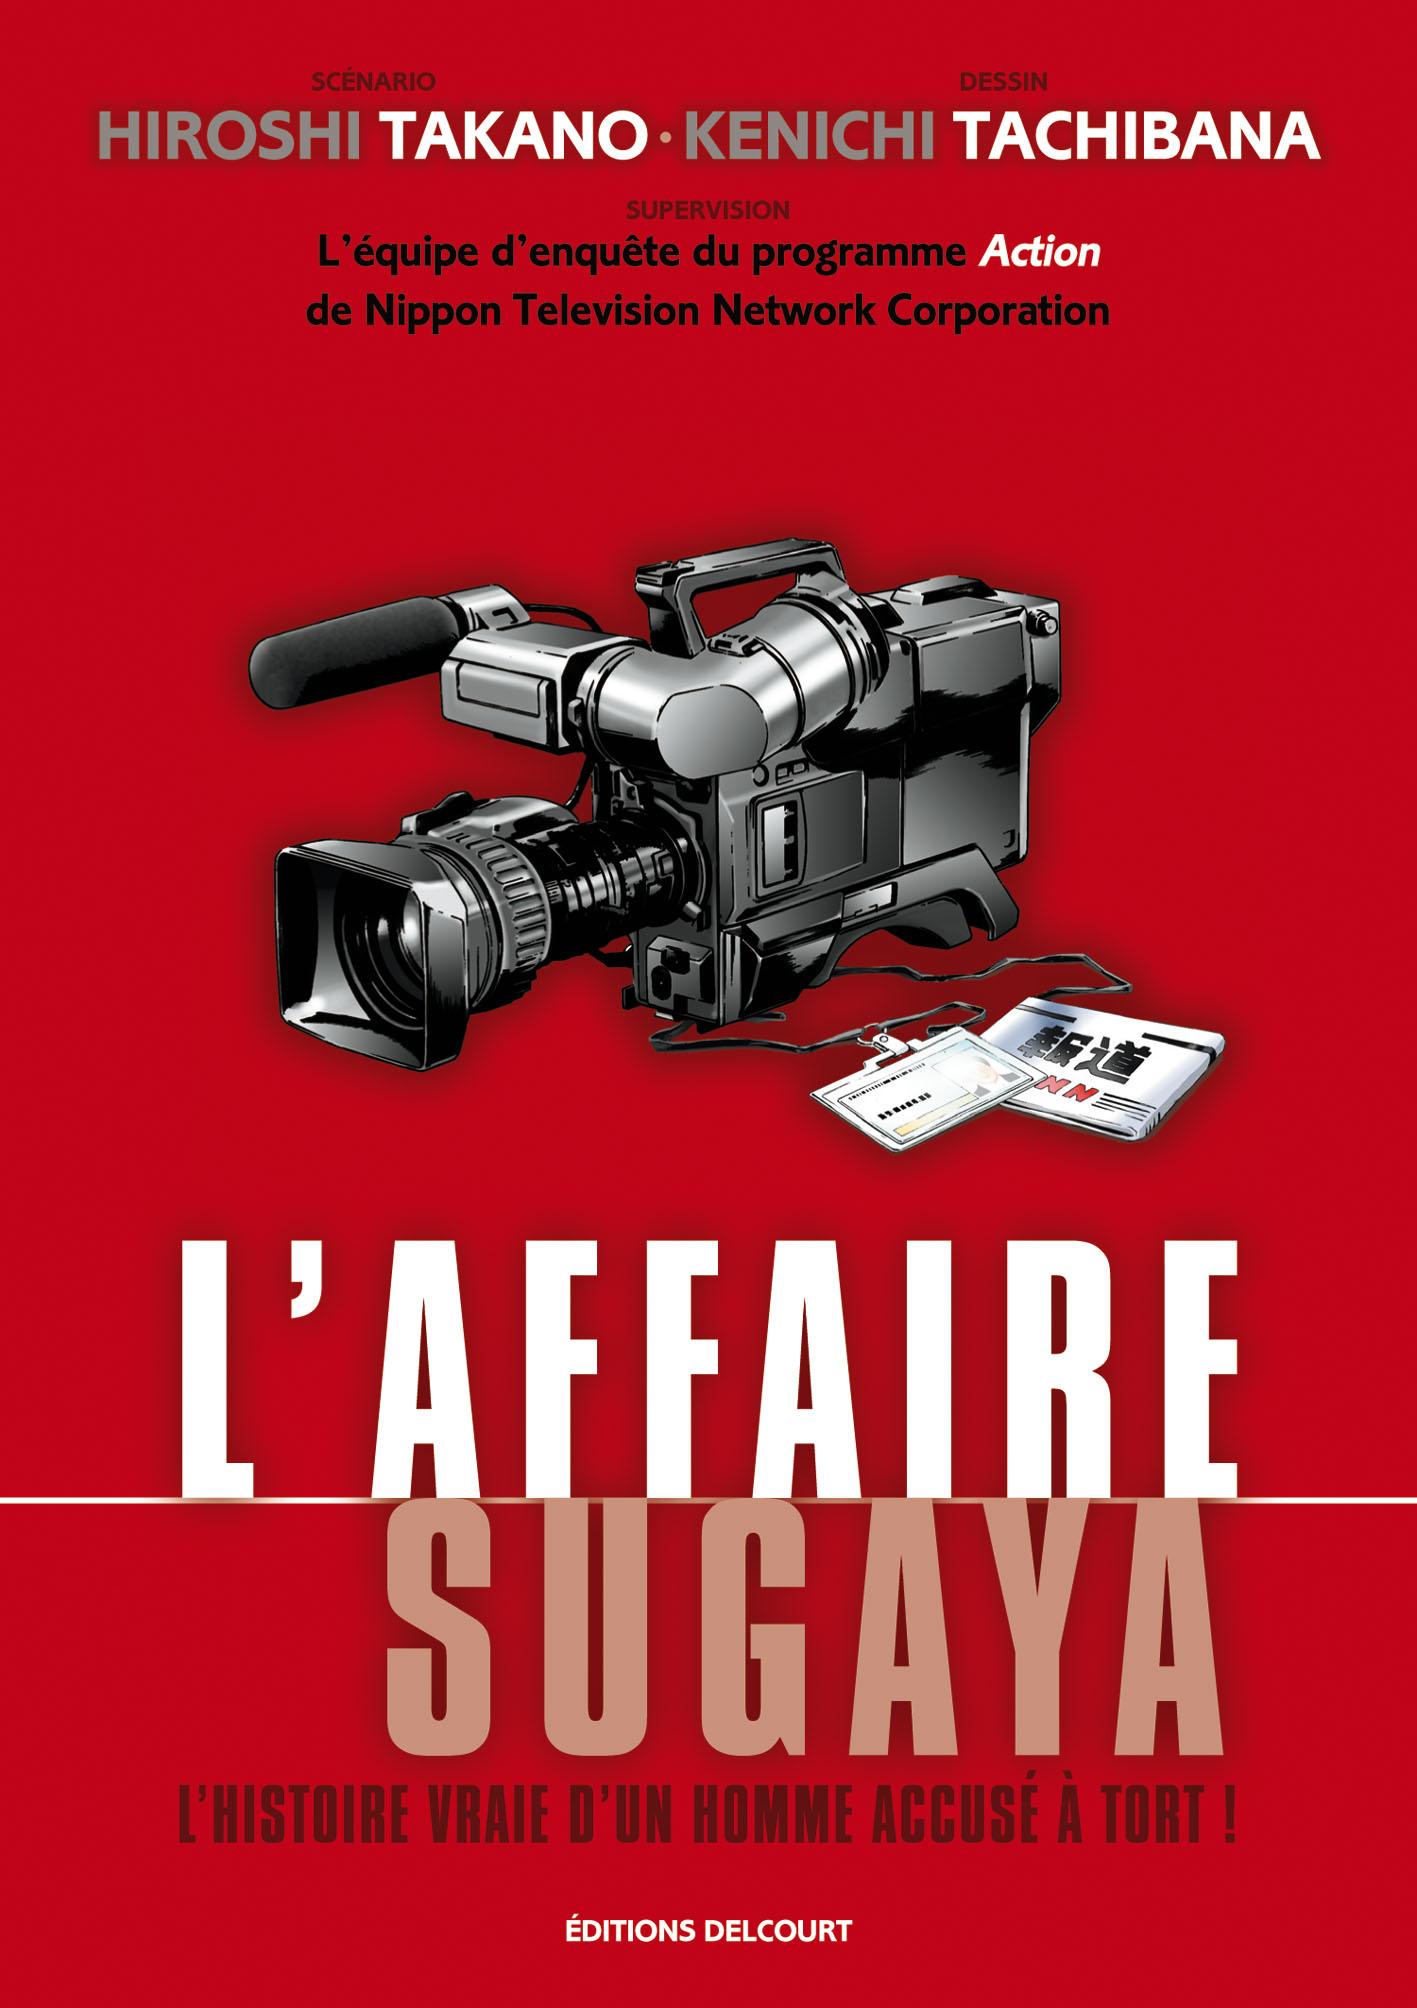 http://img.manga-sanctuary.com/big/l-affaire-sugaya-manga-volume-1-simple-47958.jpg